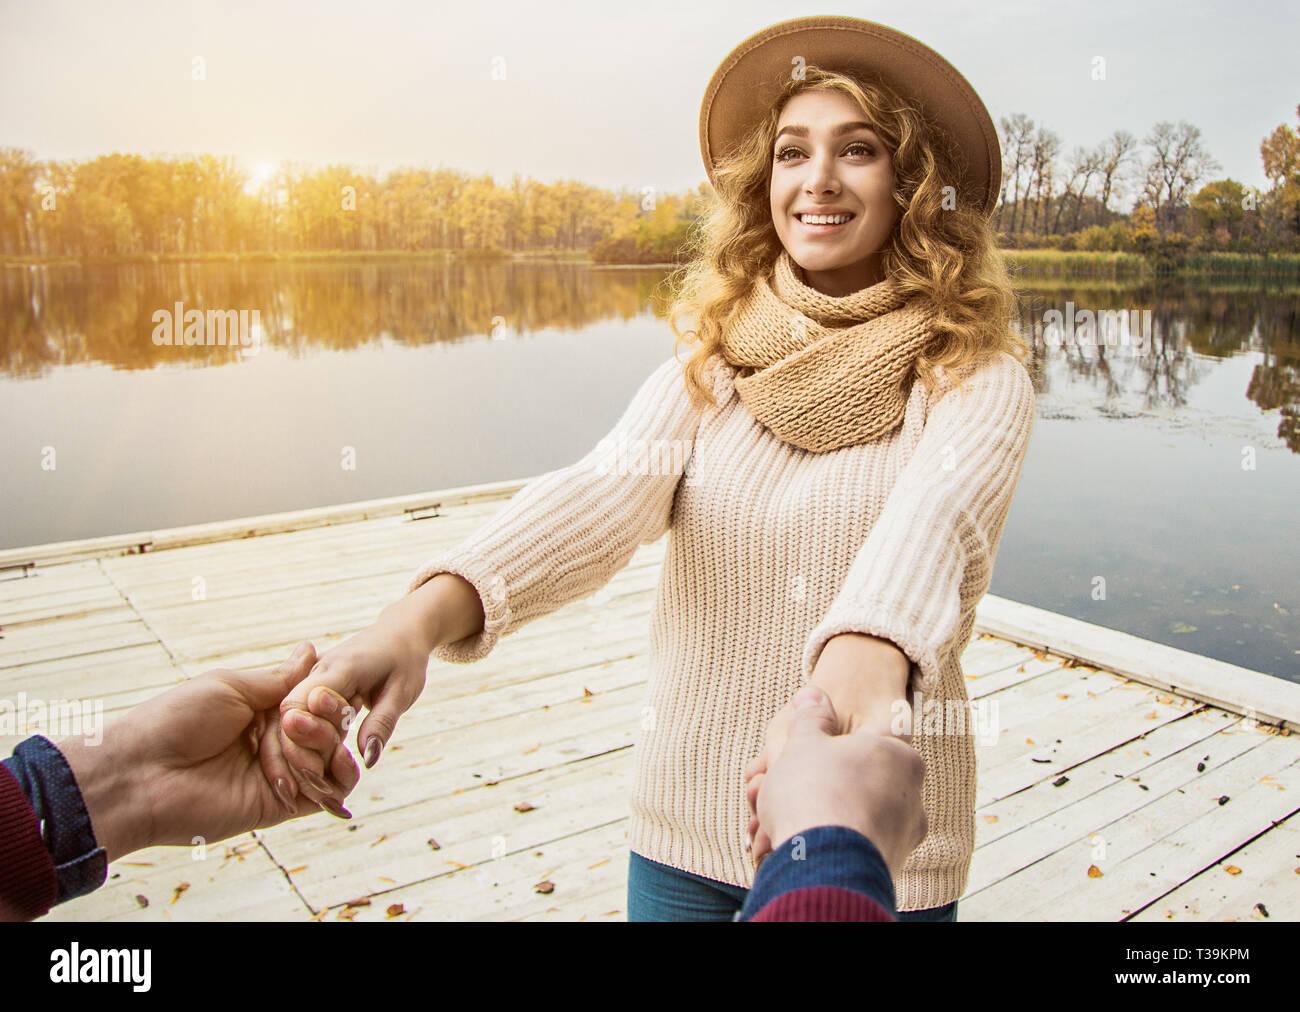 Kostenlose Vancouver asiatische Datierung